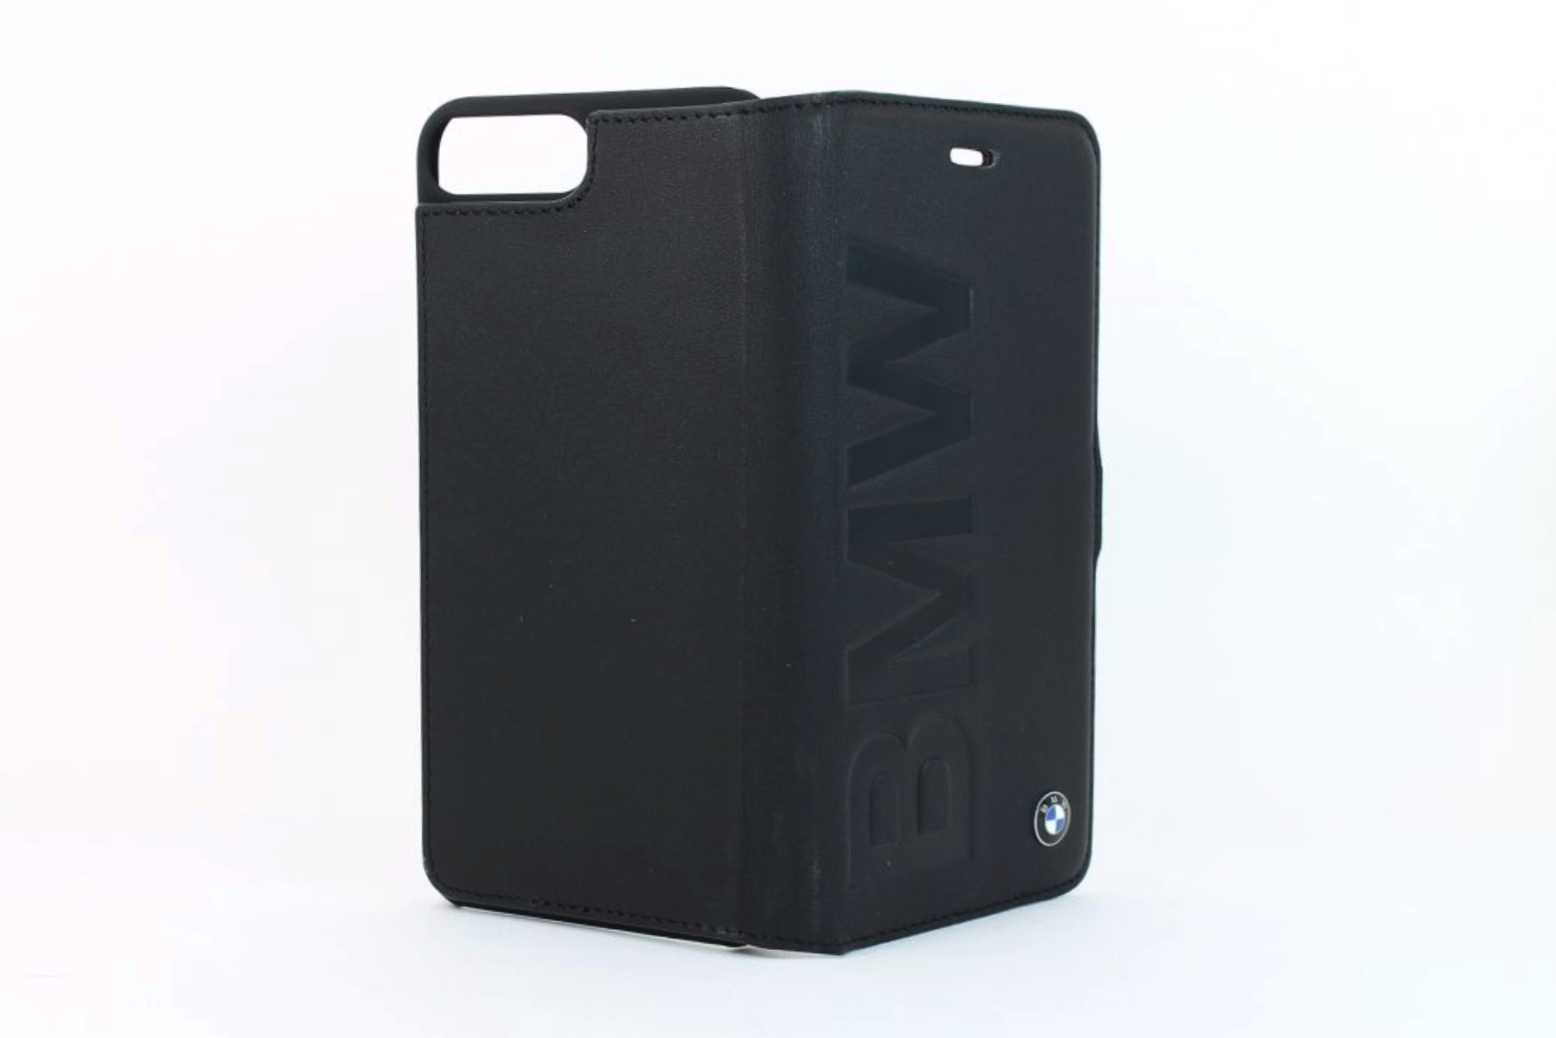 bmw signature iphone 7 plus booktype wallet case debossed. Black Bedroom Furniture Sets. Home Design Ideas